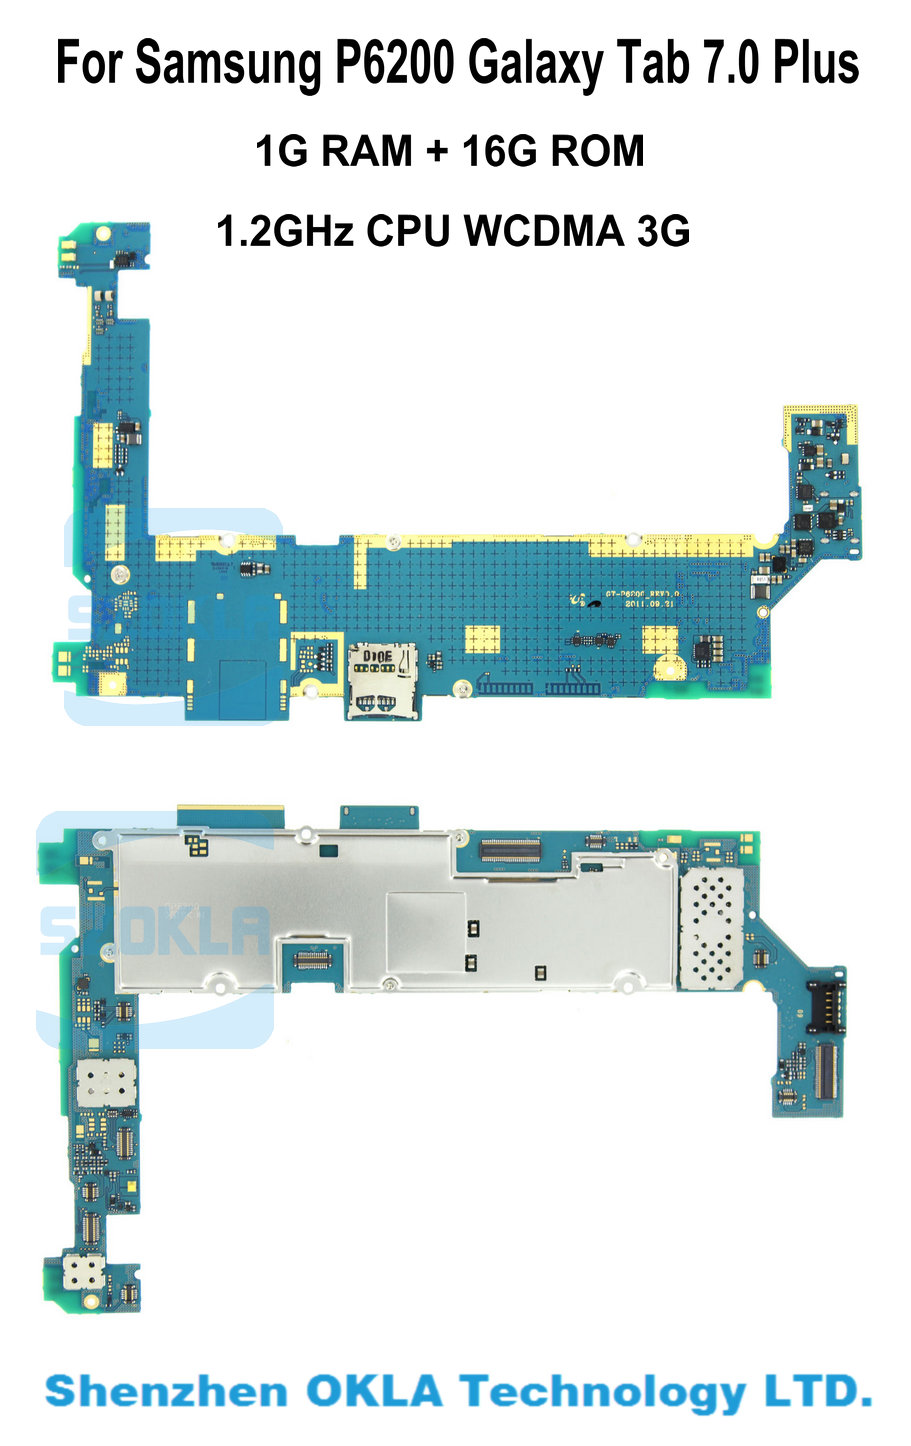 Buy 1pcs For Xiaomi Redmi1 Hongmi 1 Mi1 1g Ram 4g Logic Diagram Of Samsung Galaxy Tab 70 Plus P6200 16g Rom Mainboard Motherboard Board